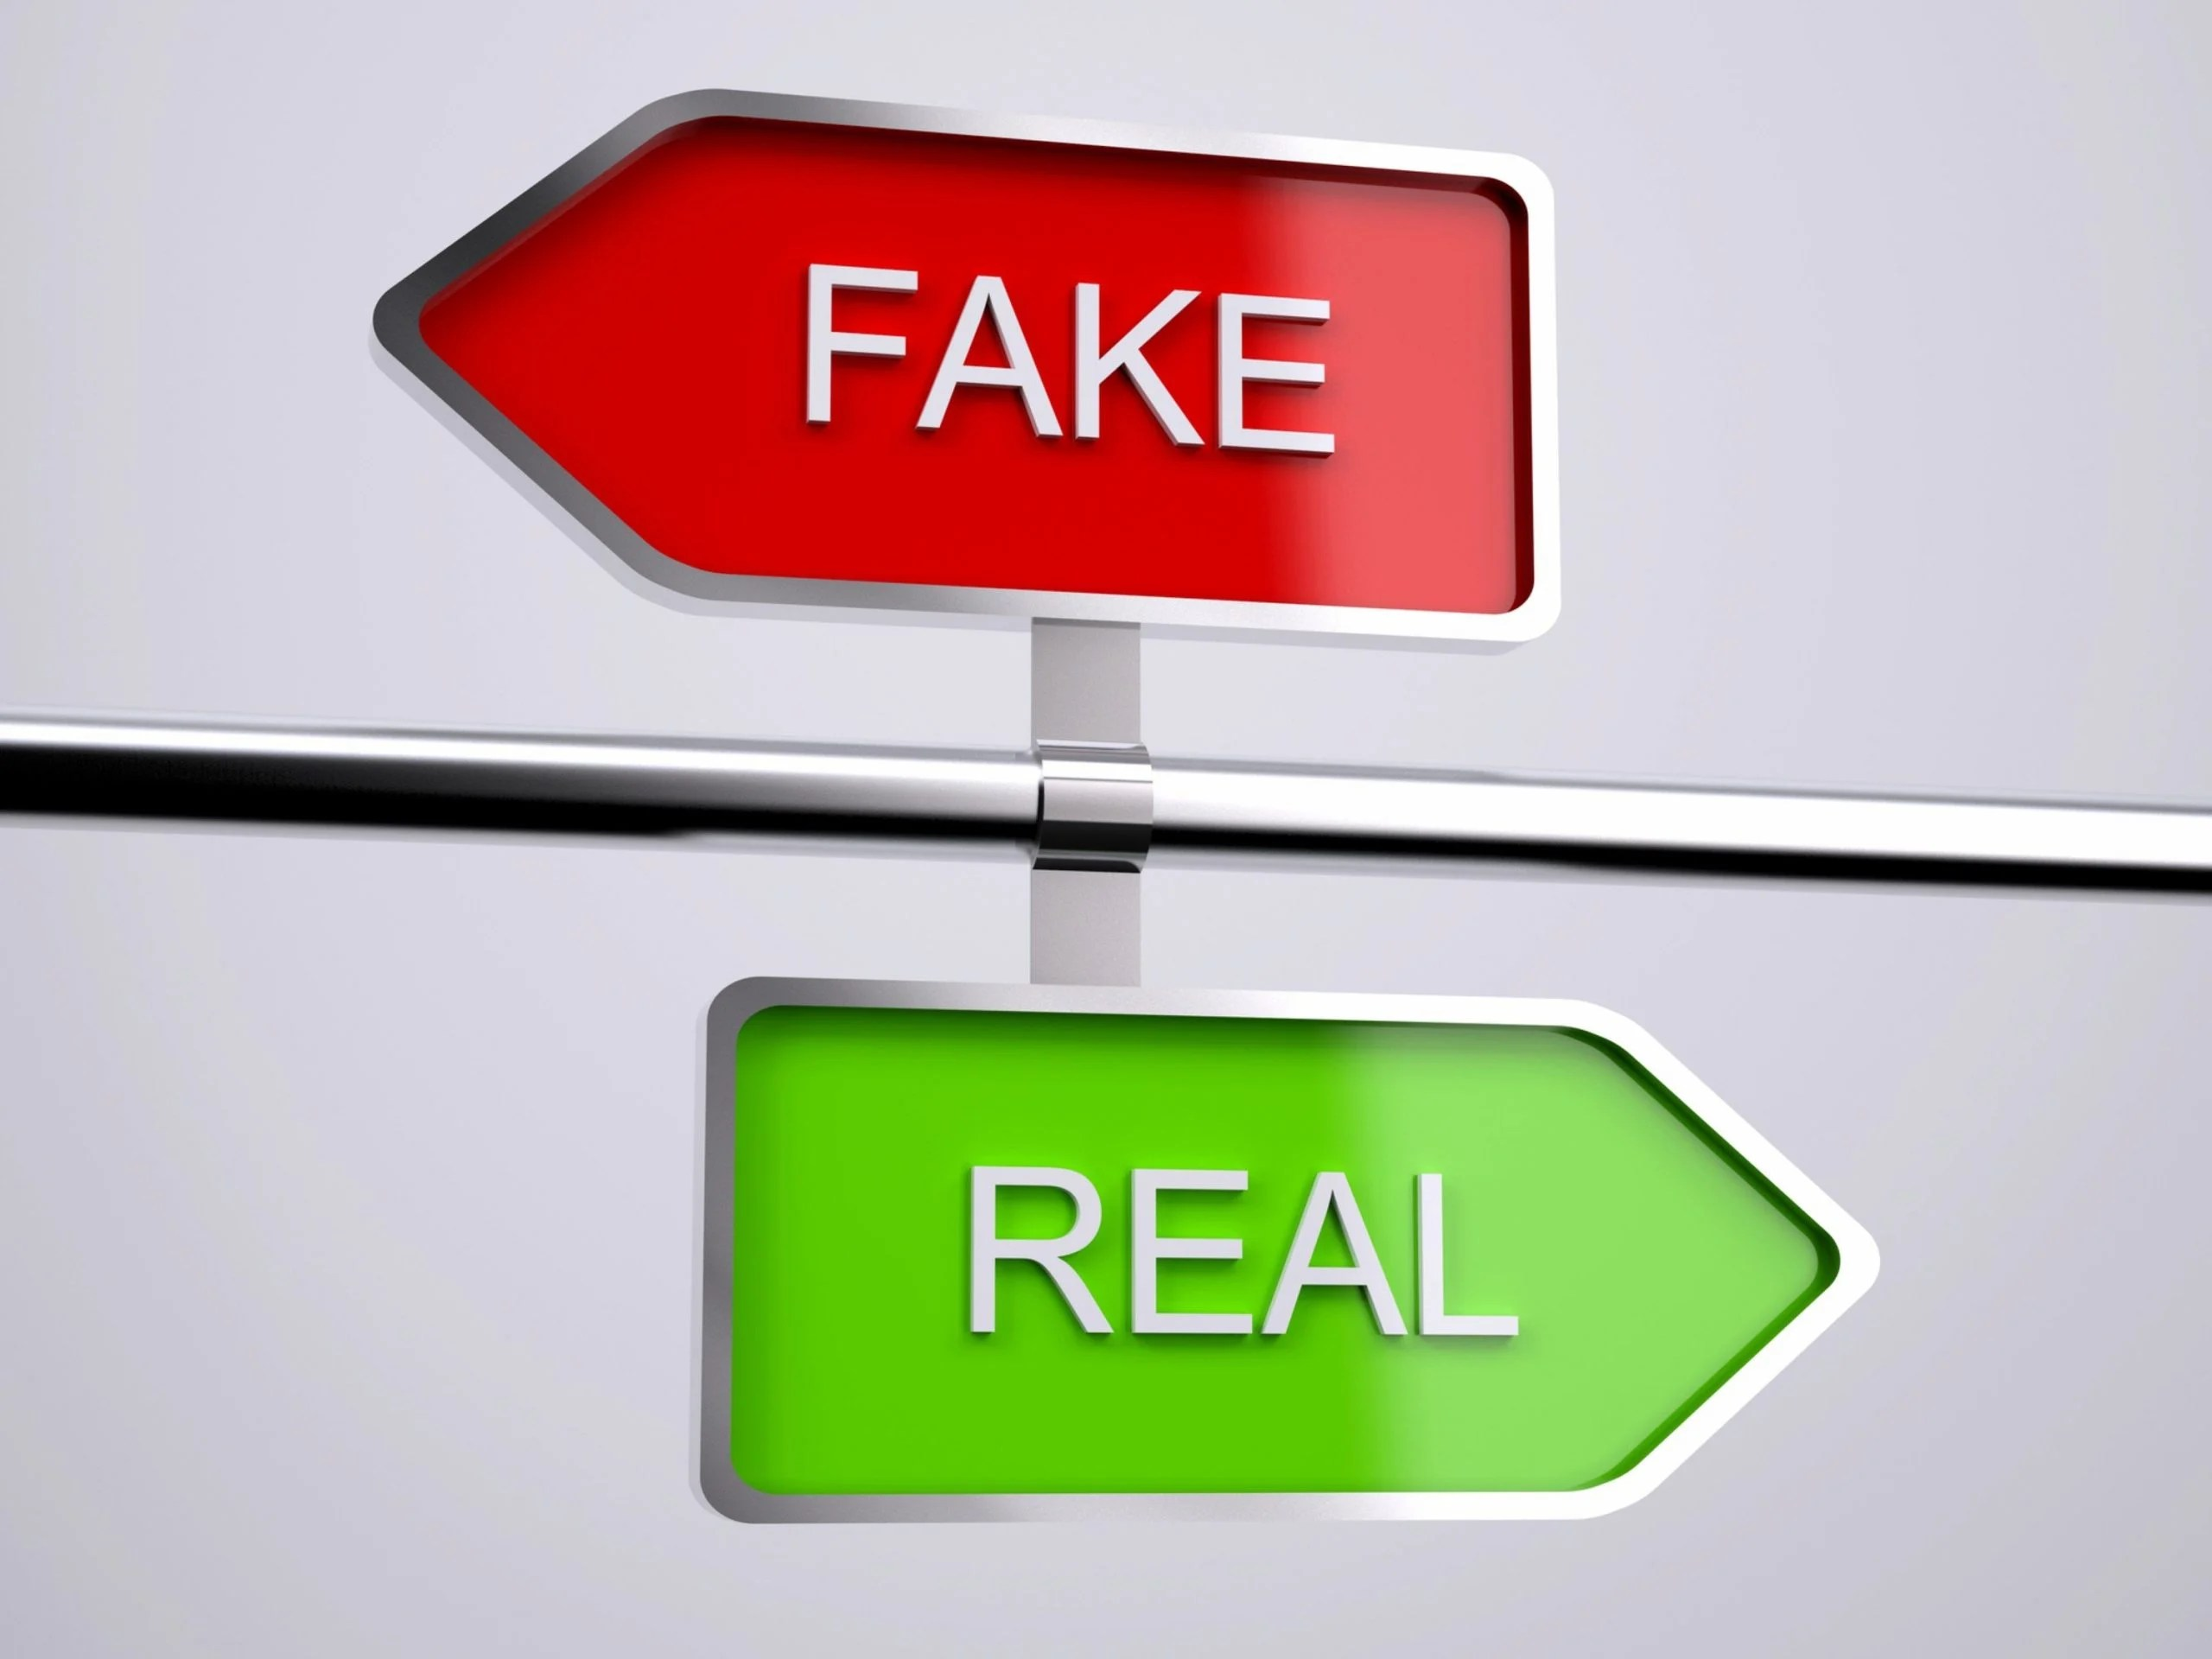 authentic customer relationships - fake vs real ID 86444609 © Fabio Berti